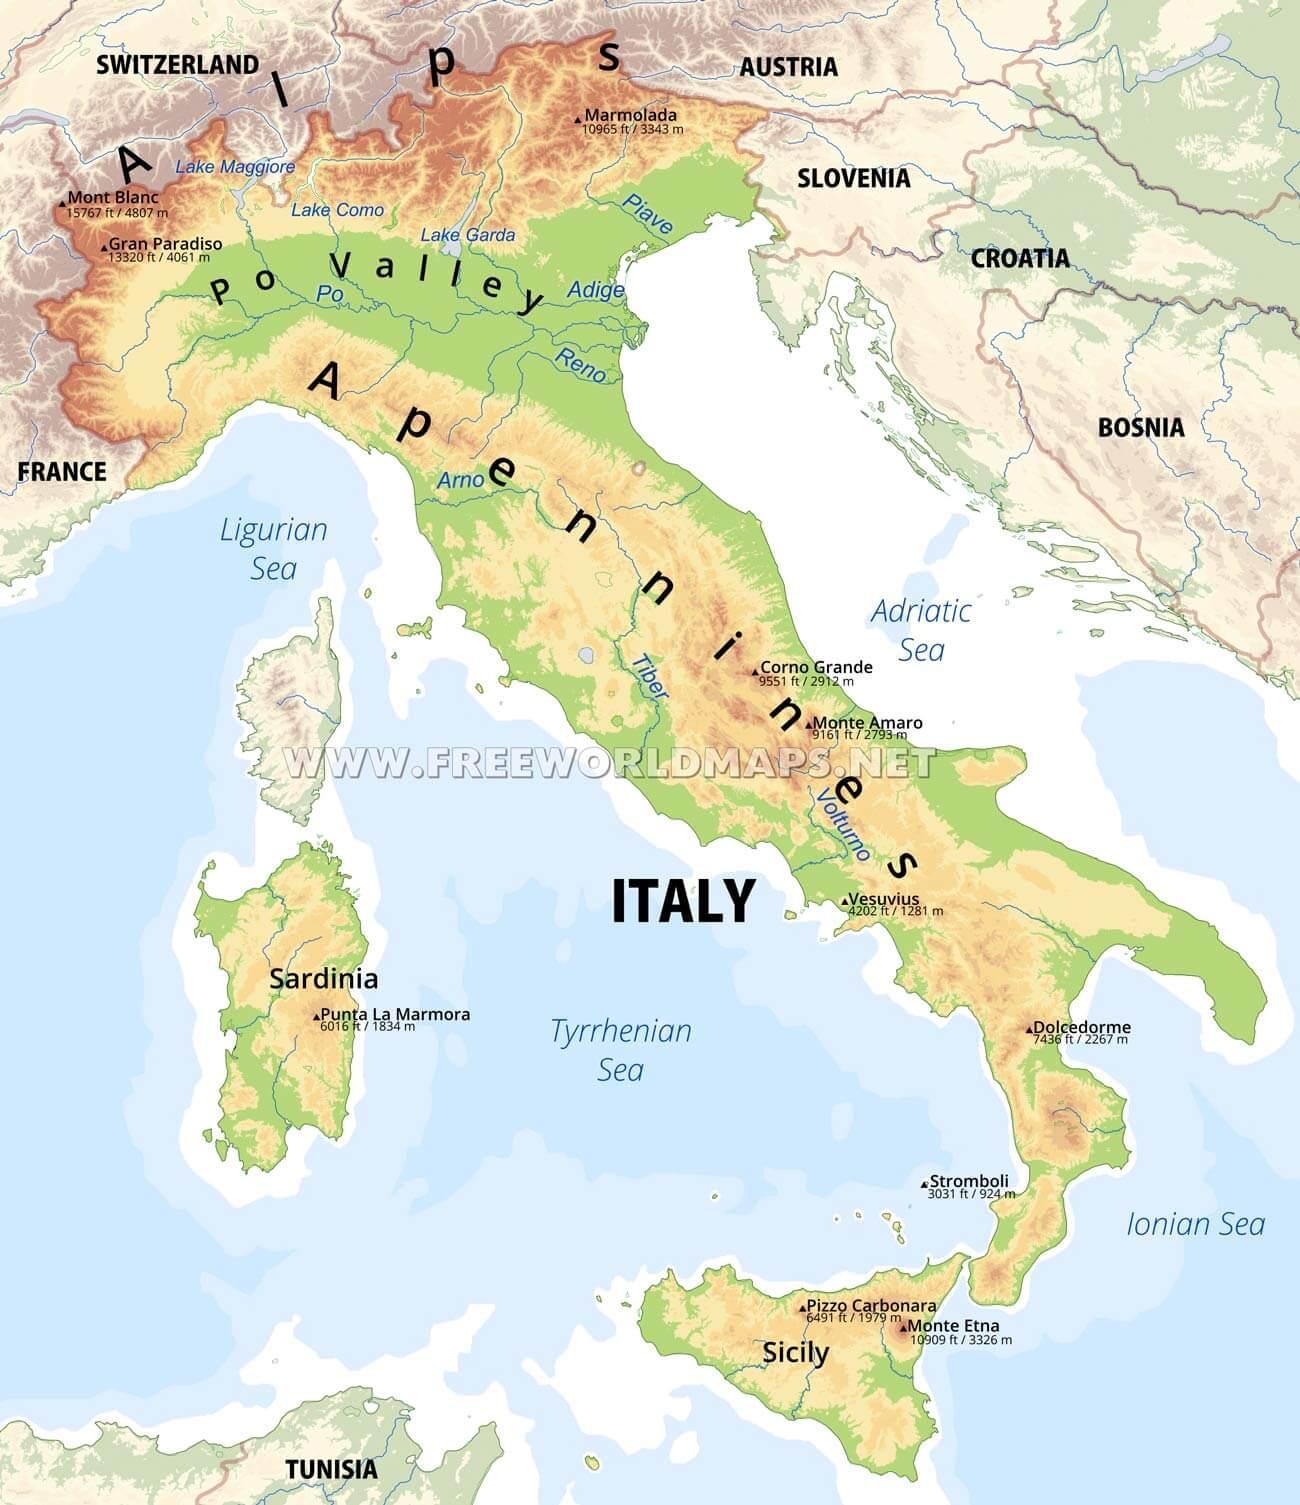 kart over italia Fysisk kart over Italia   Italia fysiske funksjoner kart (Sør  kart over italia